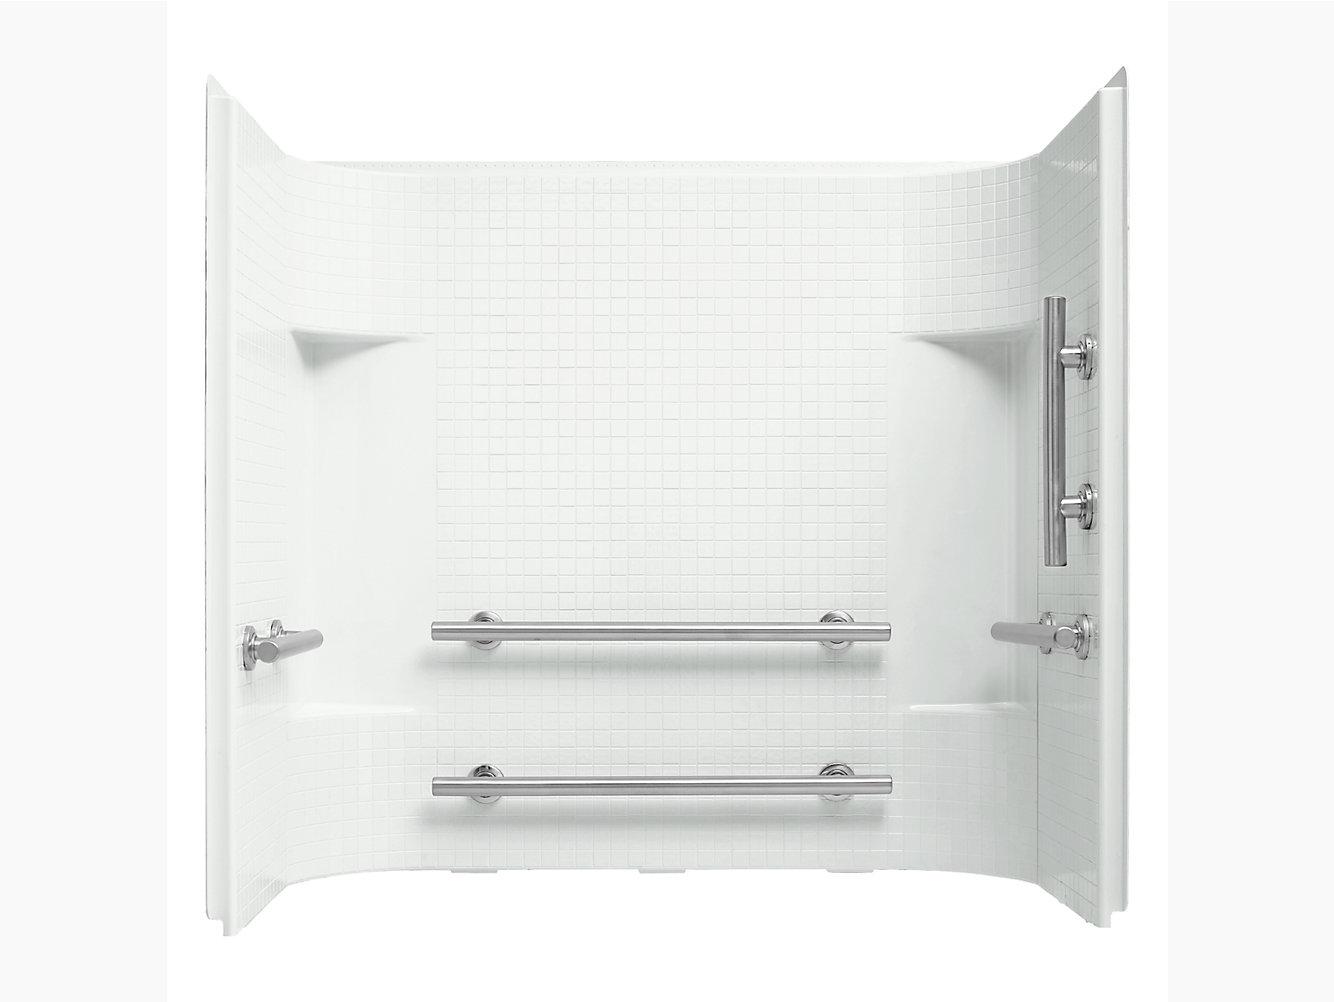 "Accord Series 7114, 60"" x 30"" Wall Set With Grab Bars | 71144123 ..."